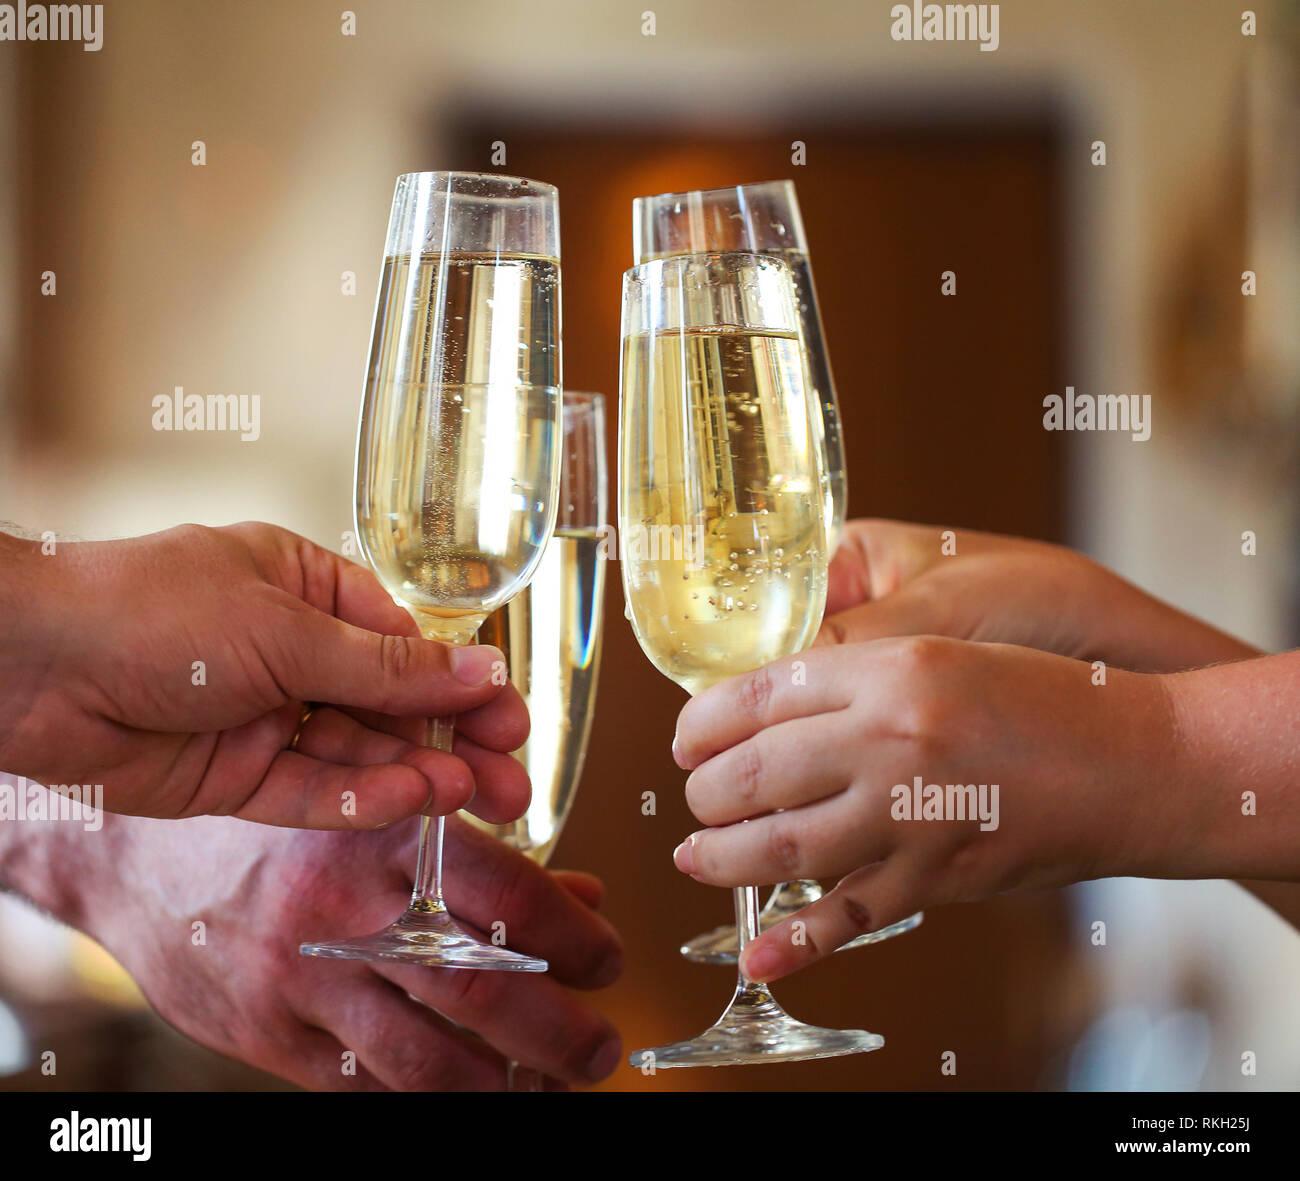 celebration people holding glasses